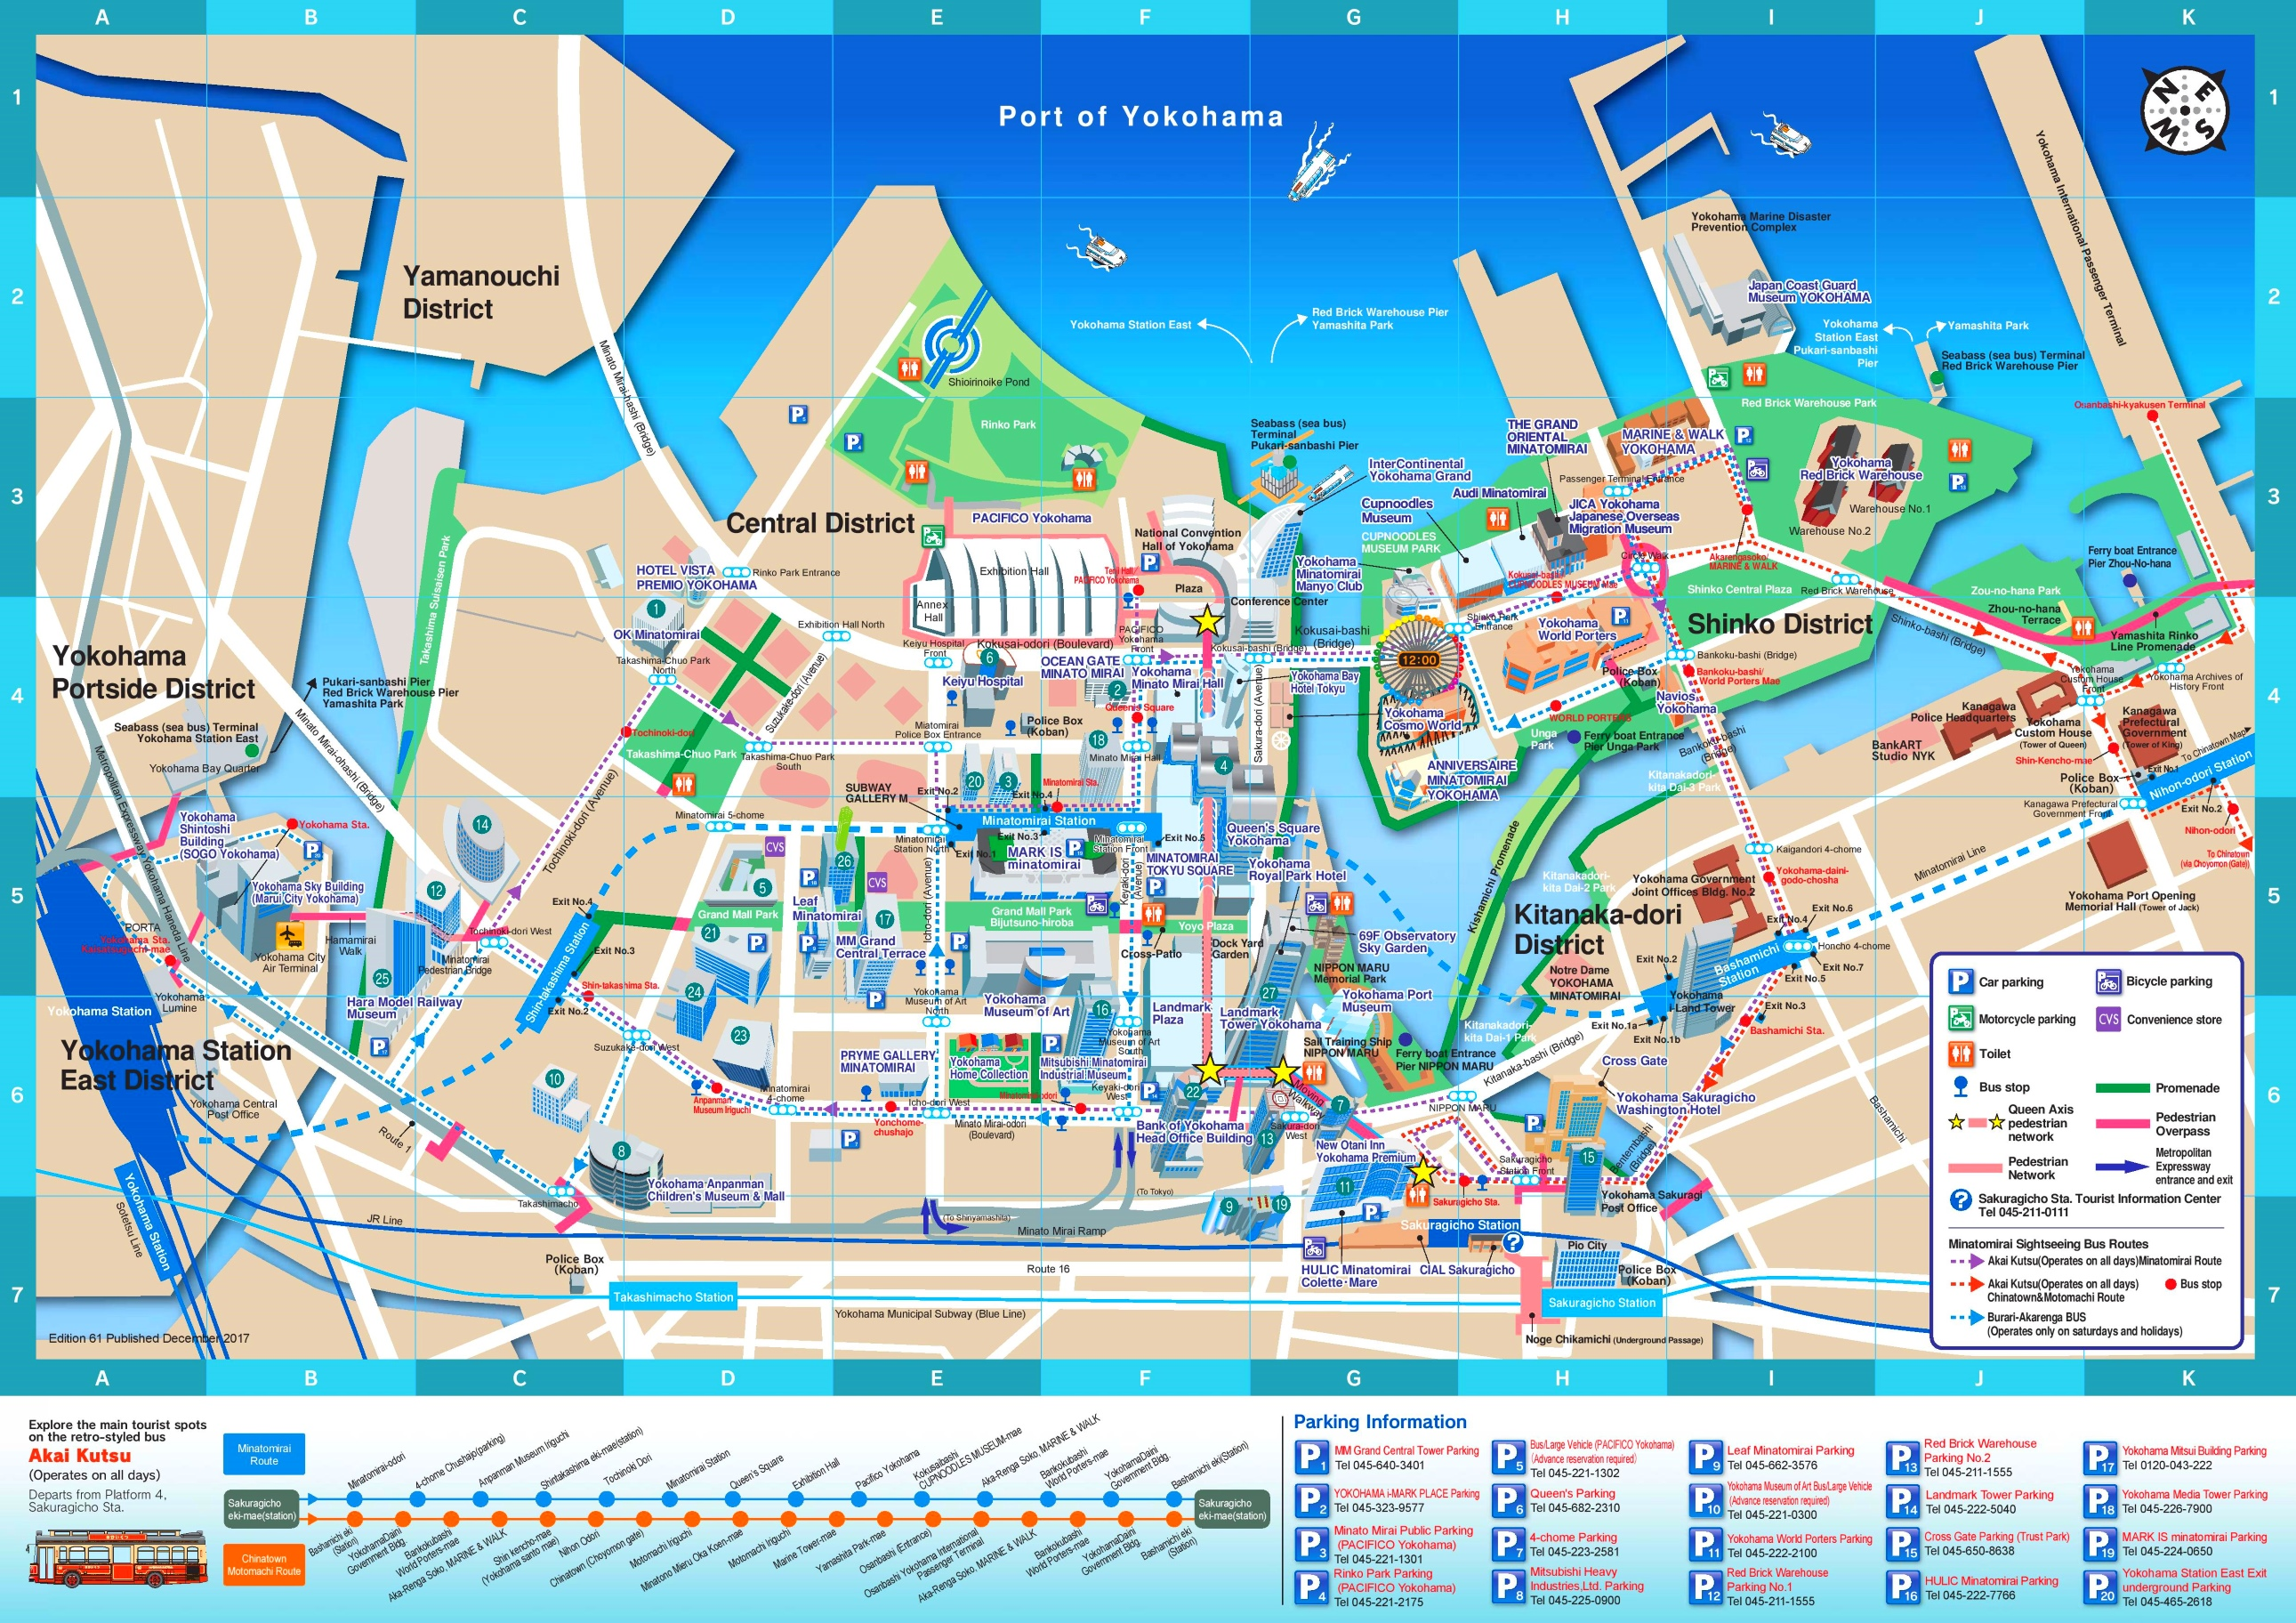 Yokohama downtown map on hilla map, asahikawa map, suginami map, taiohae map, nakameguro map, pusan map, nagasaki map, gotemba map, hokkaido map, honshu map, osaka map, kyoto map, japan map, kobe map, kanagawa map, shonan map, nagoya map, manila map, kawasaki map, taipei map,